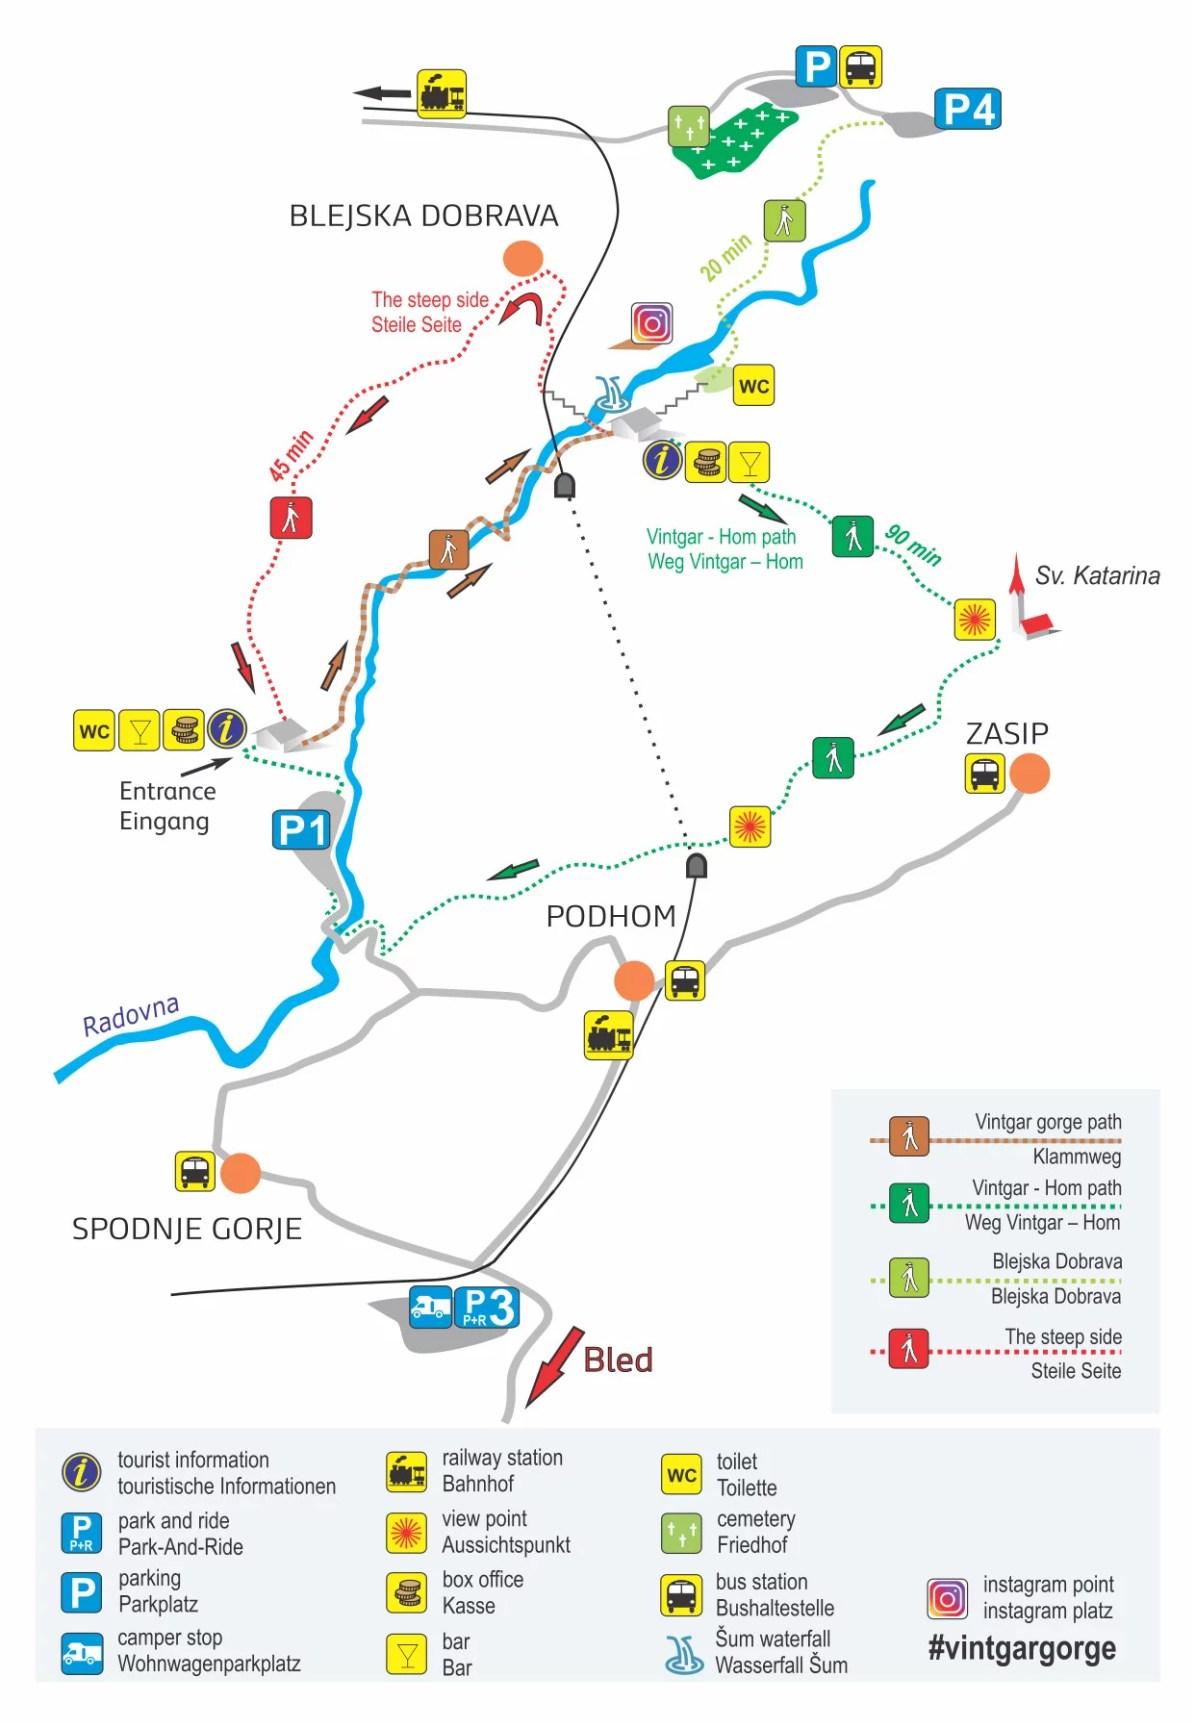 The official Vintgar Gorge map